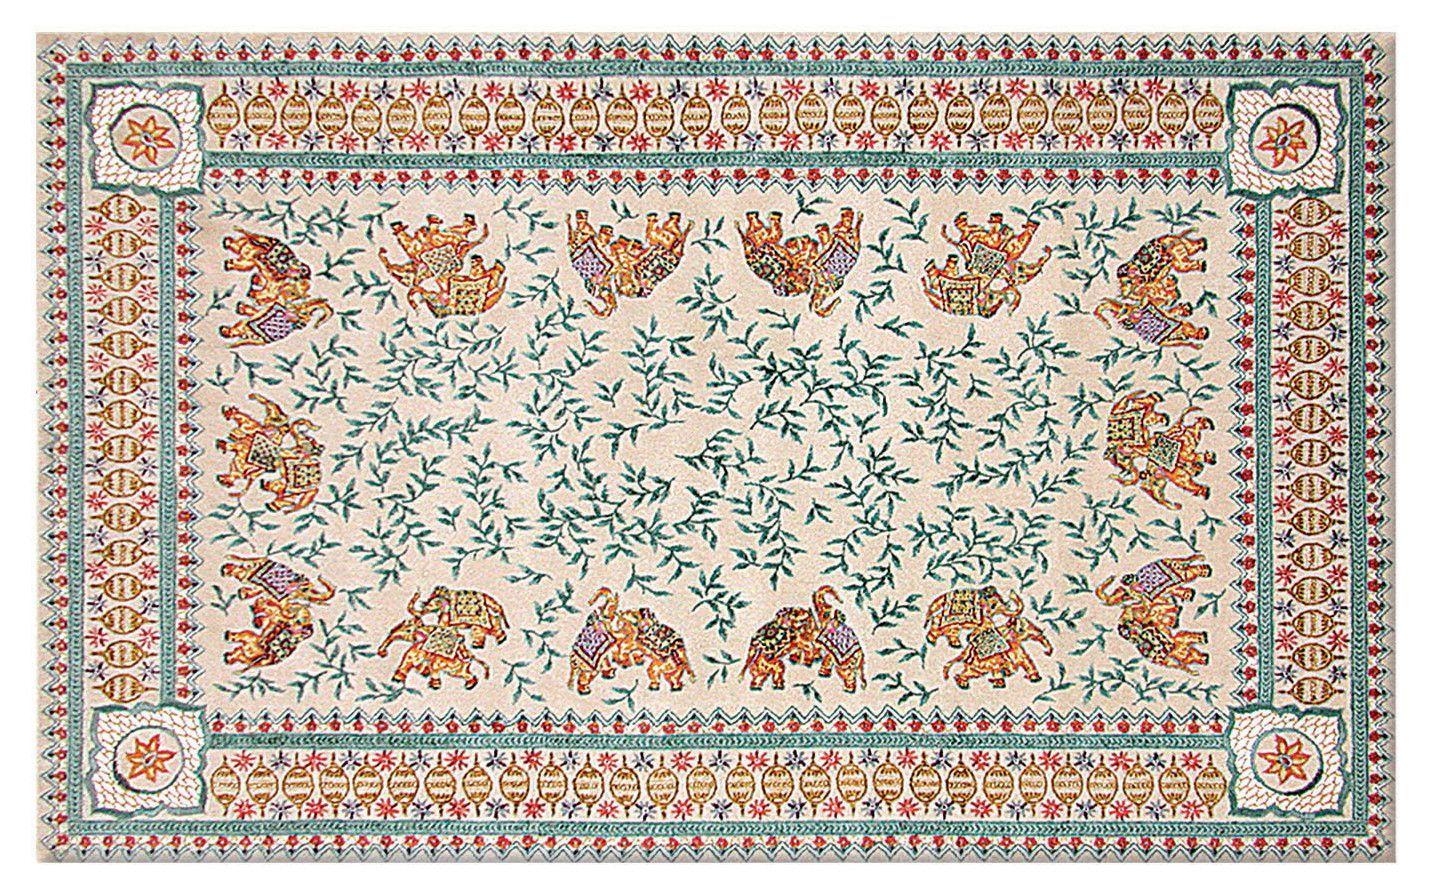 Qoryale Hand-Woven Area Rug